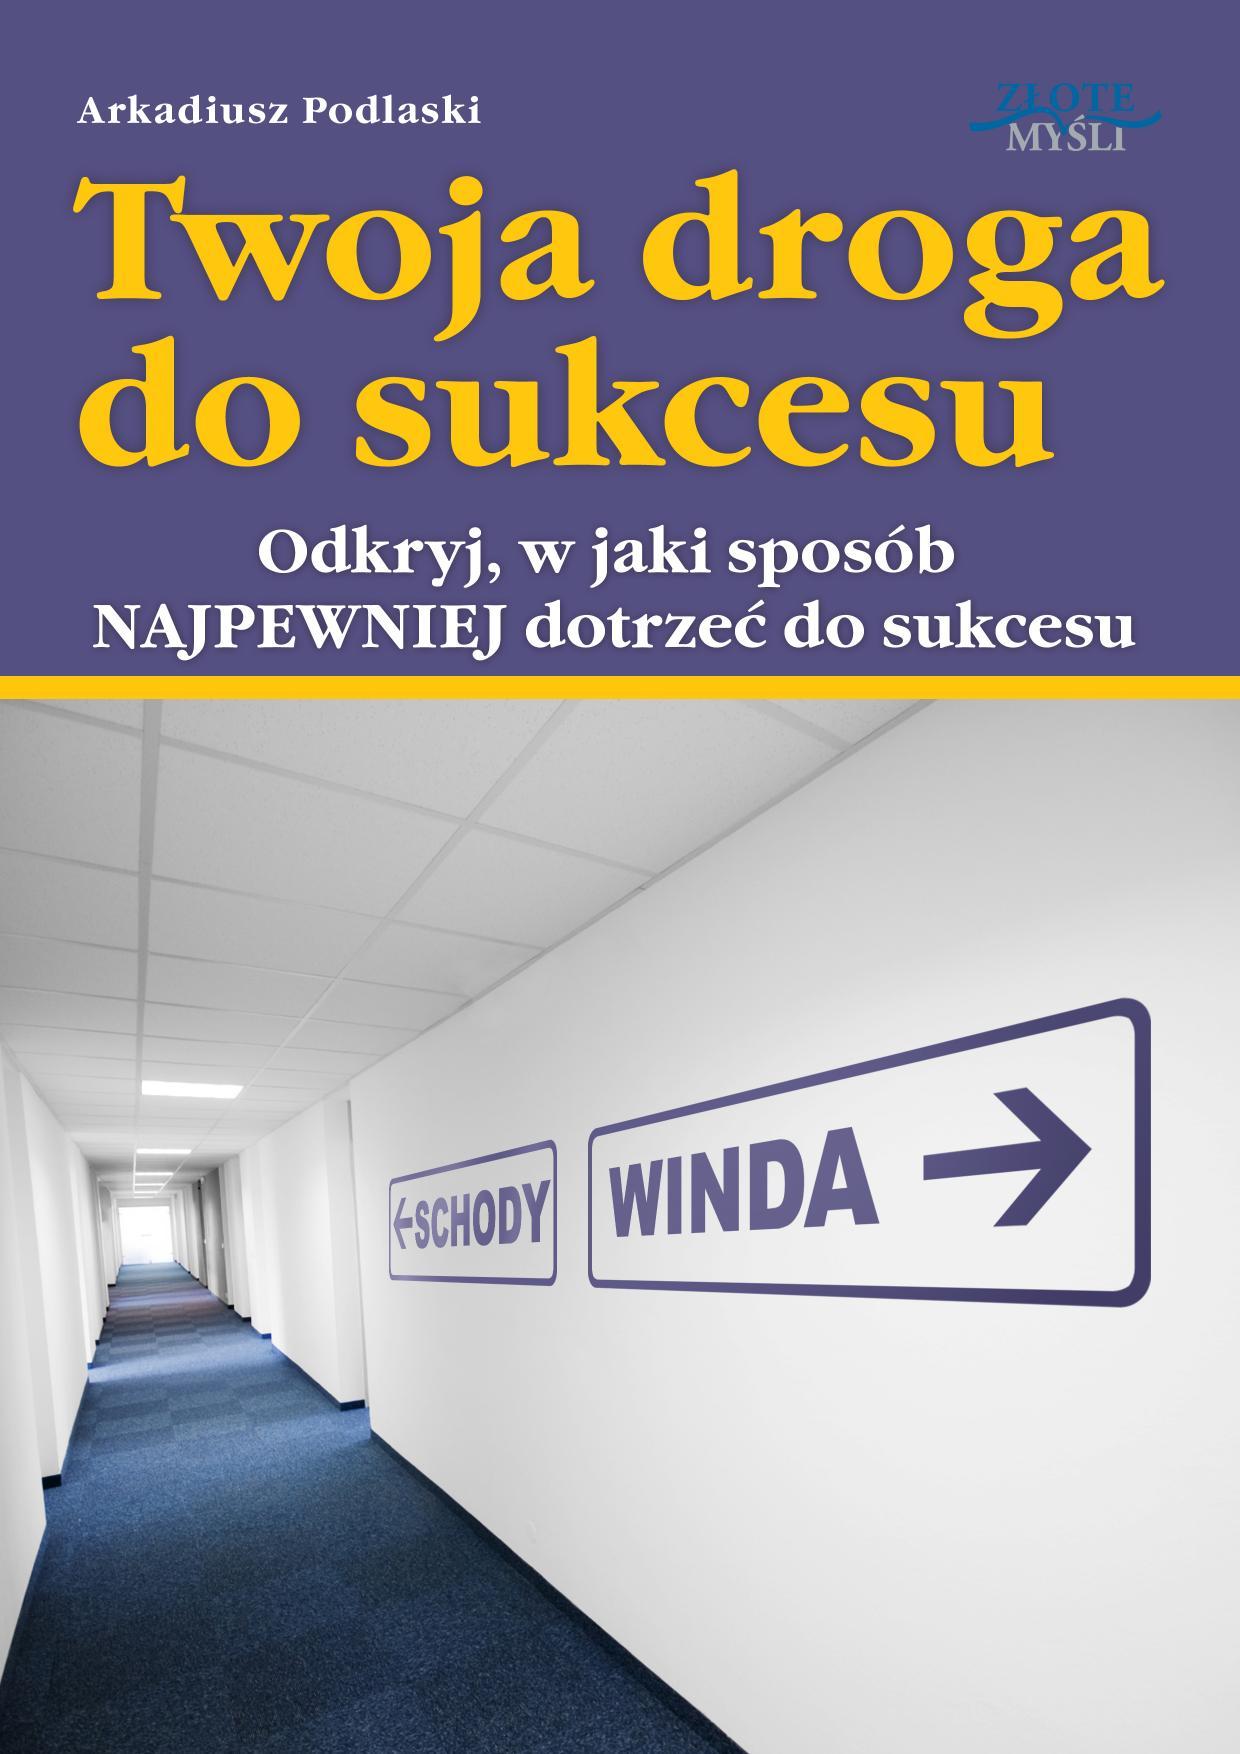 Arkadiusz Podlaski: Twoja droga do sukcesu - okładka